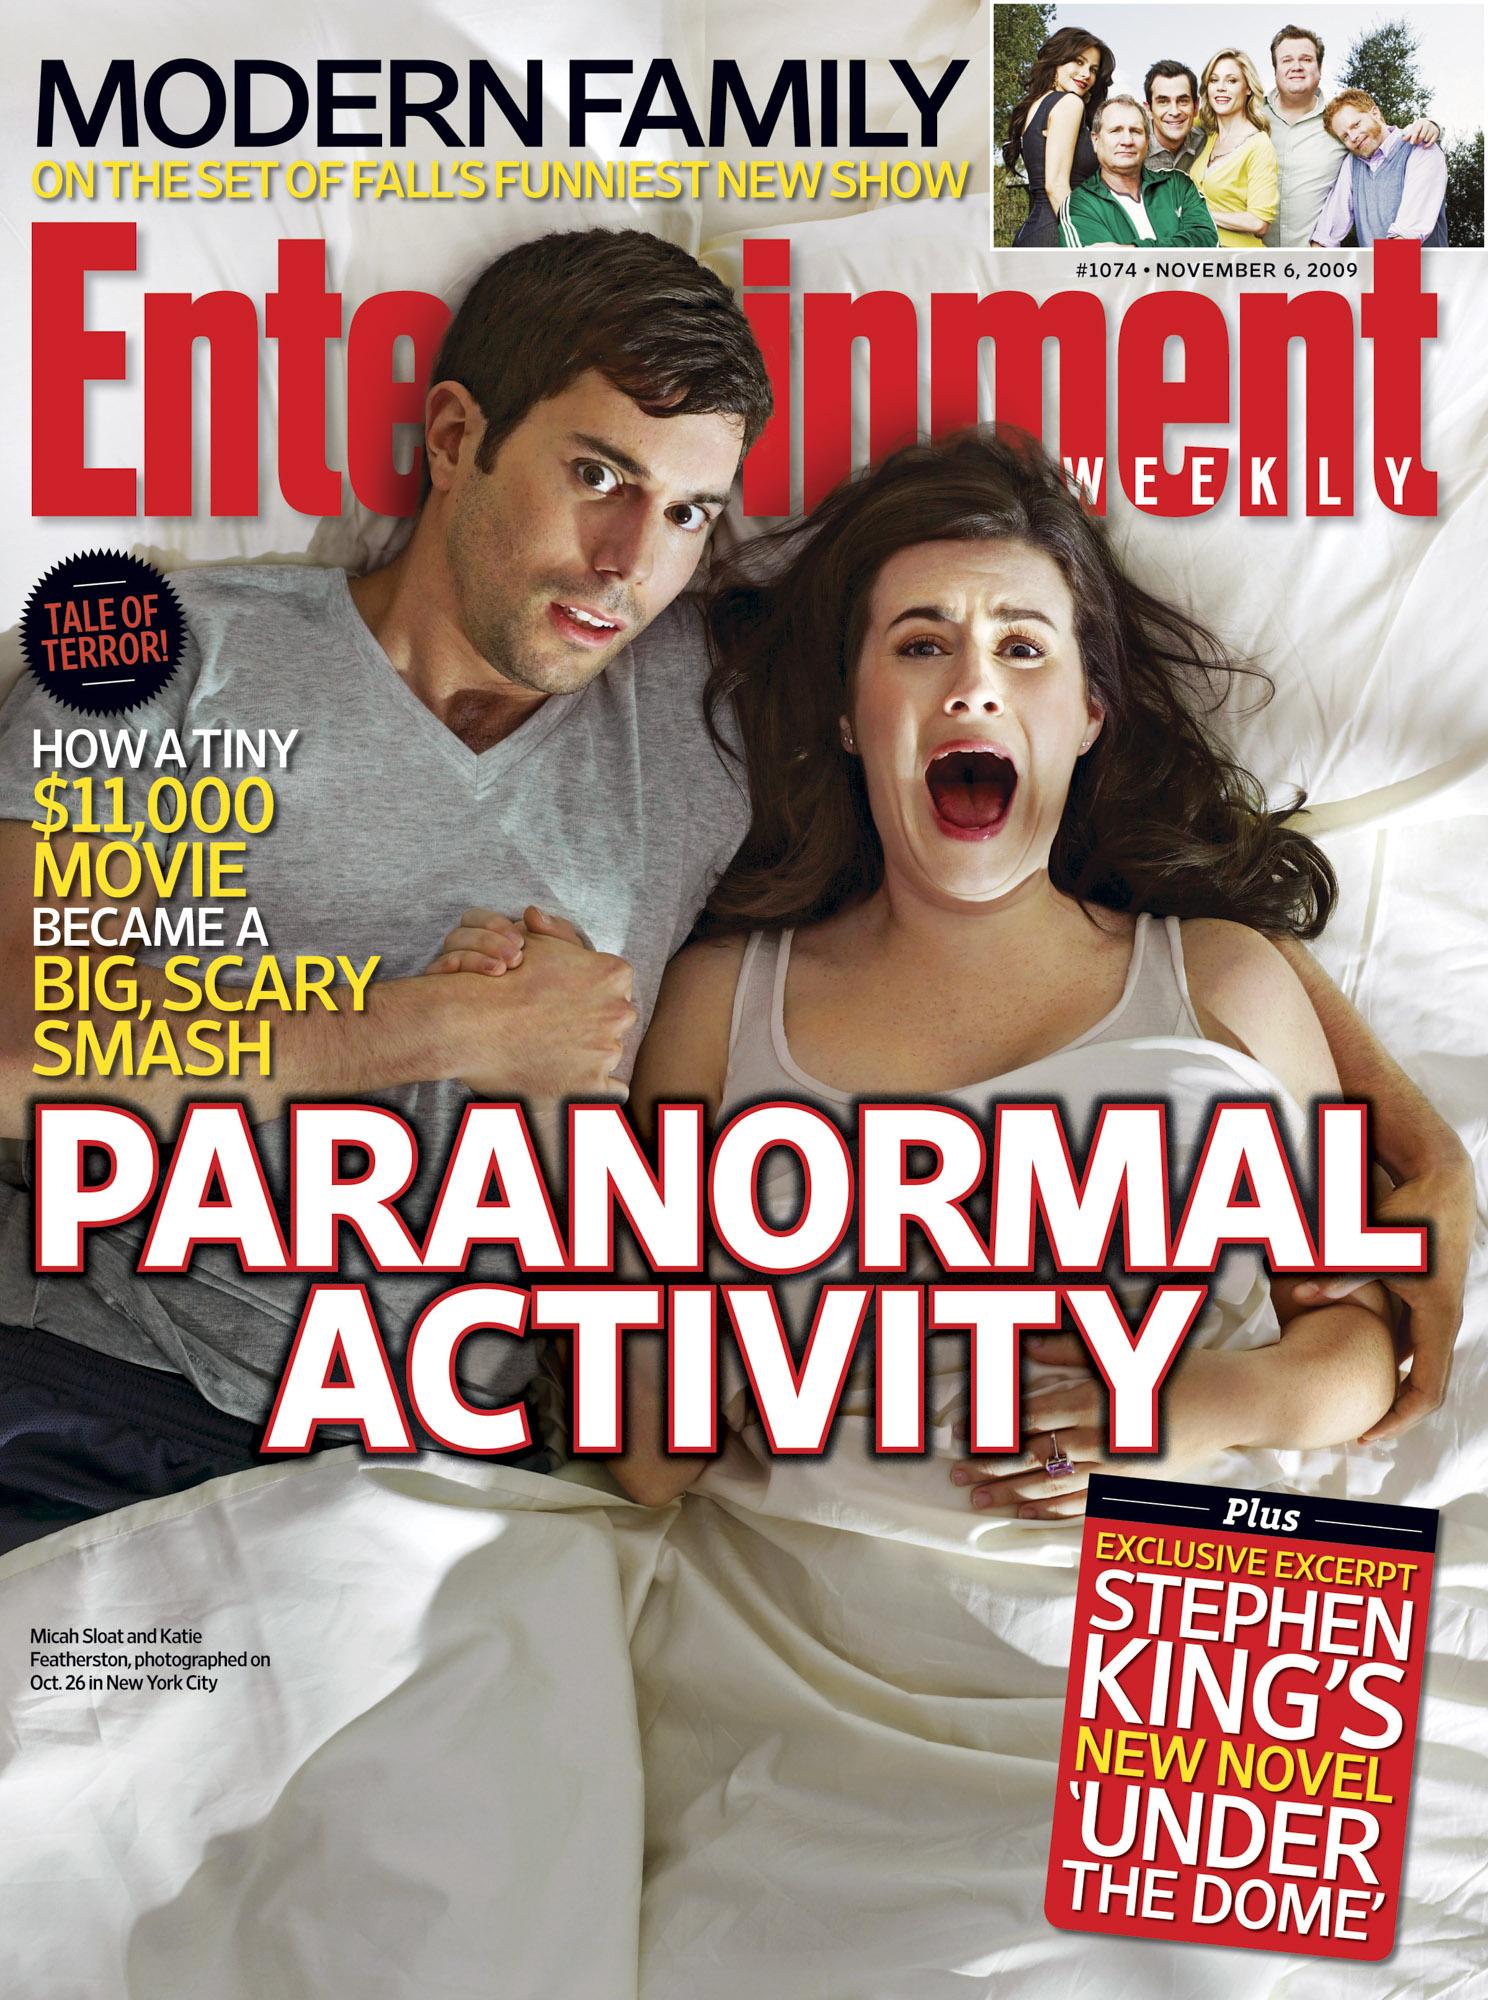 EW Horror covers